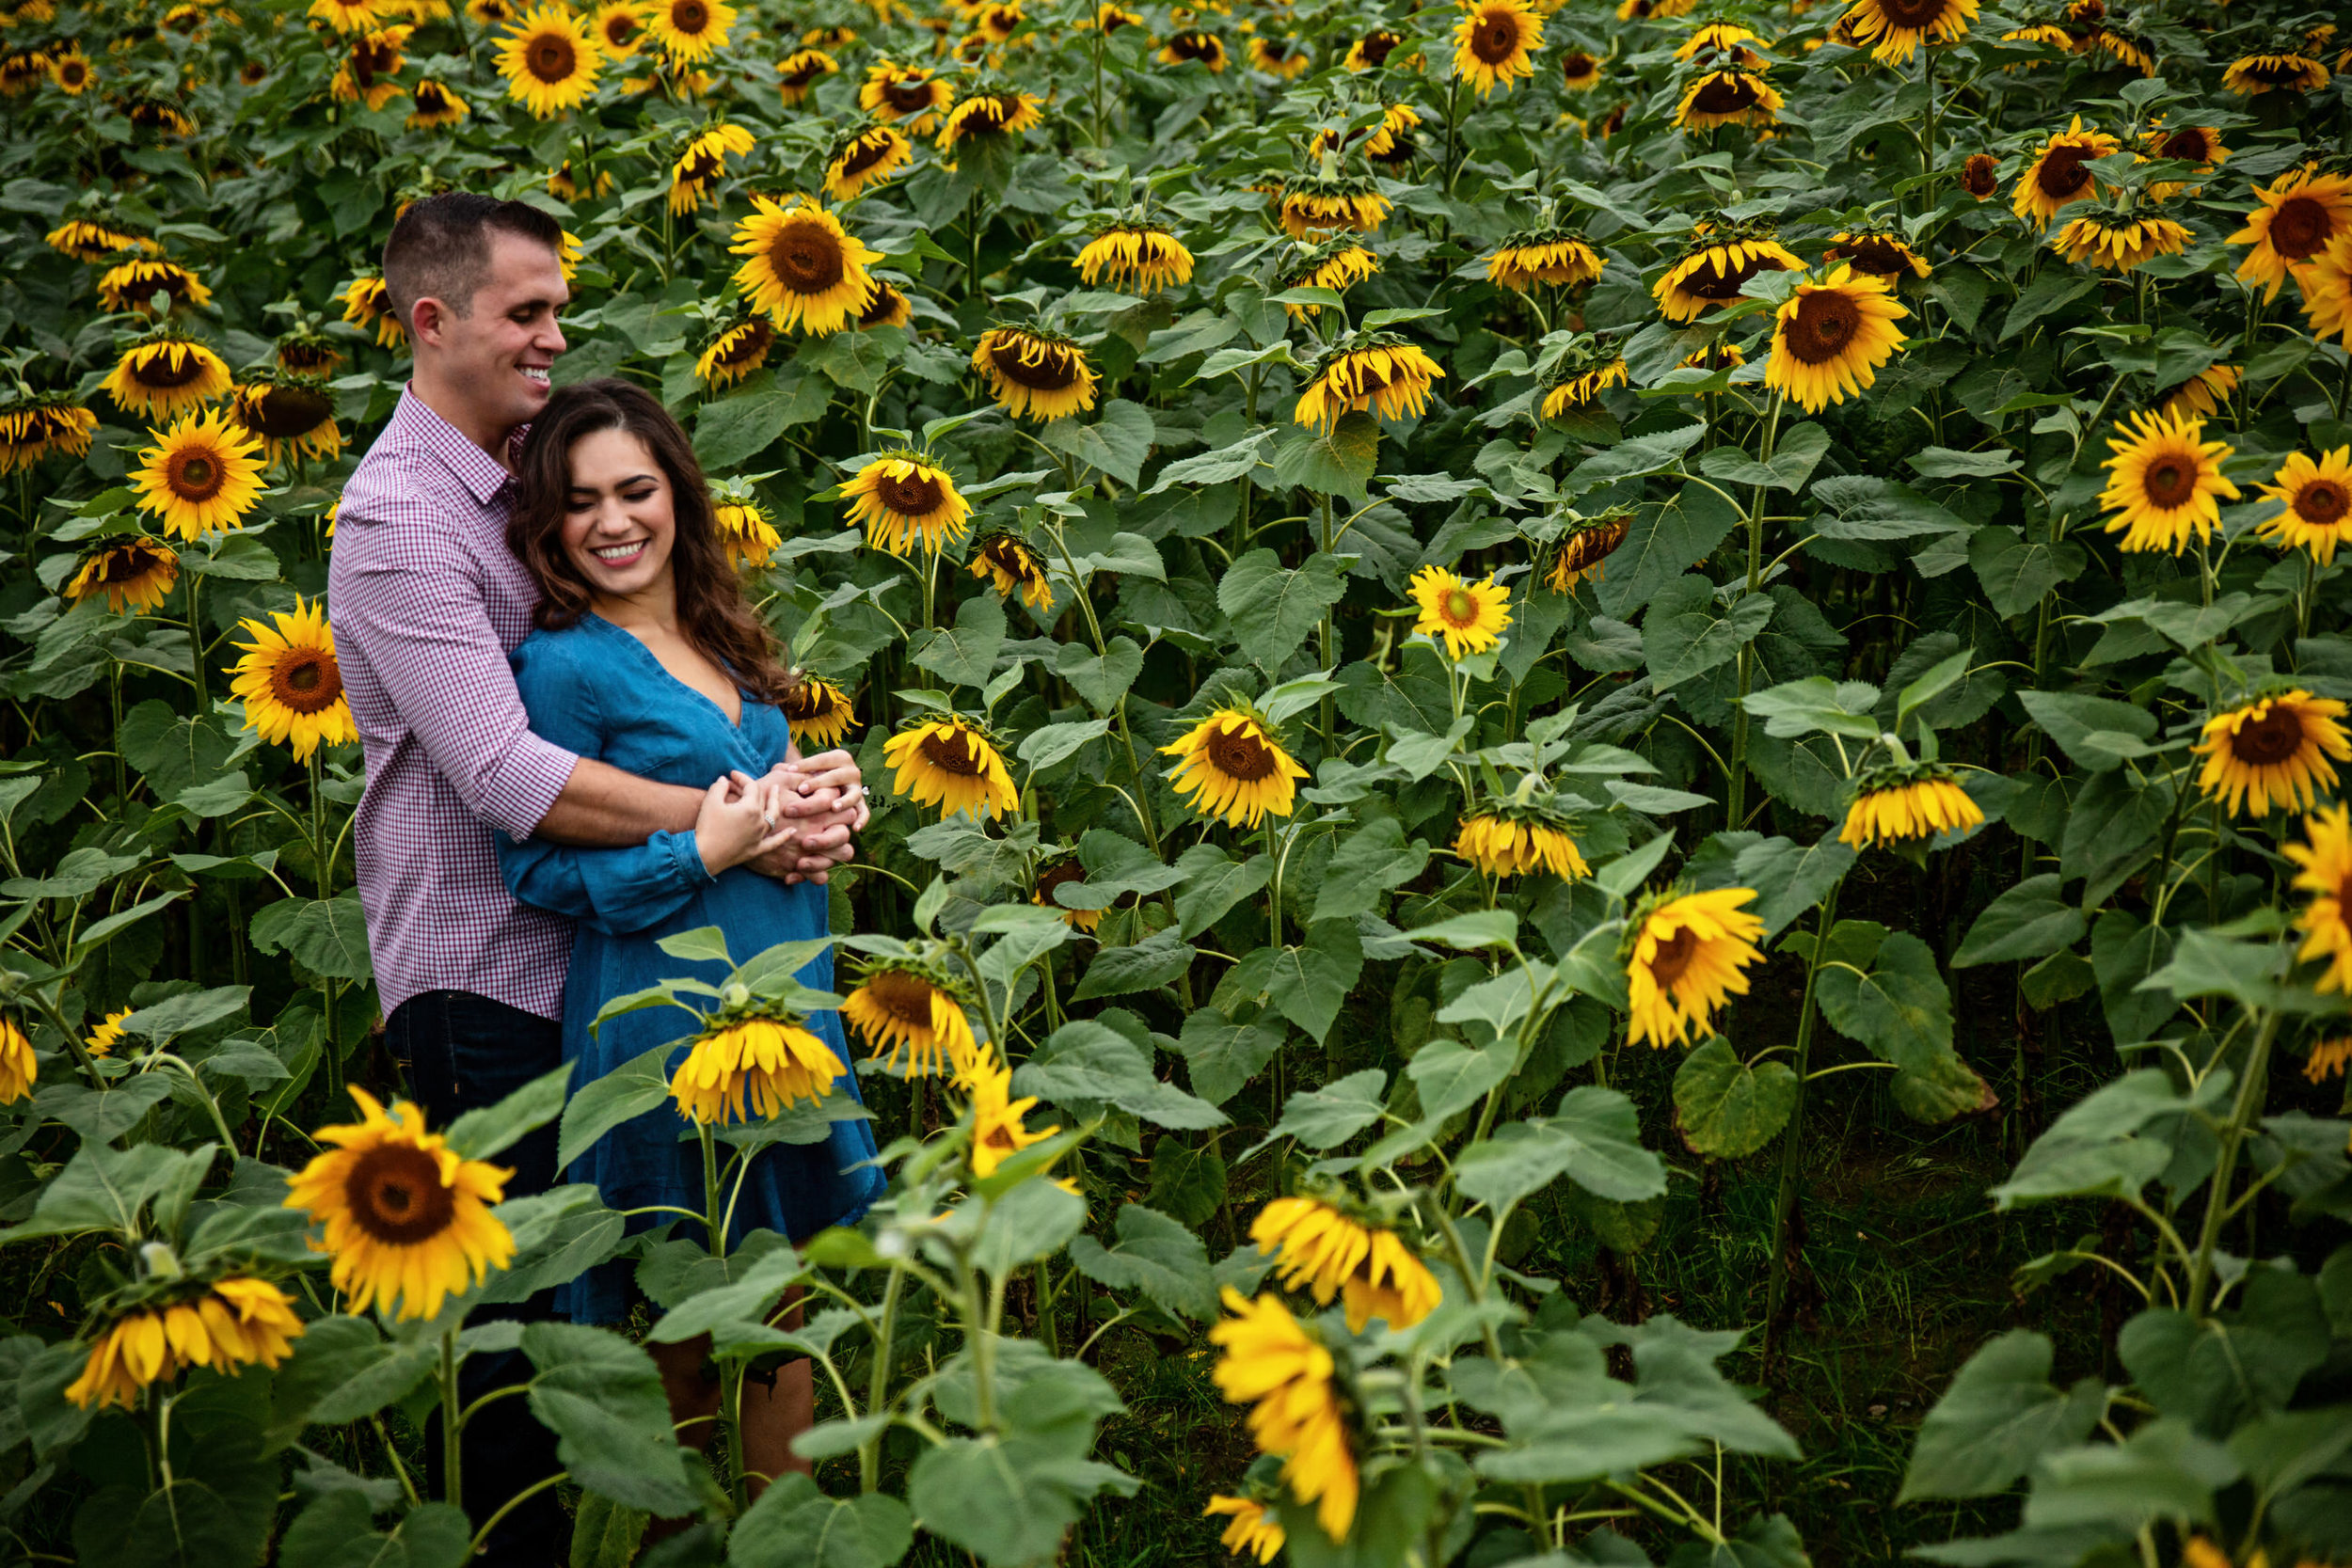 MarylandAdventureEngagement-Brenda&Tony-64.jpg